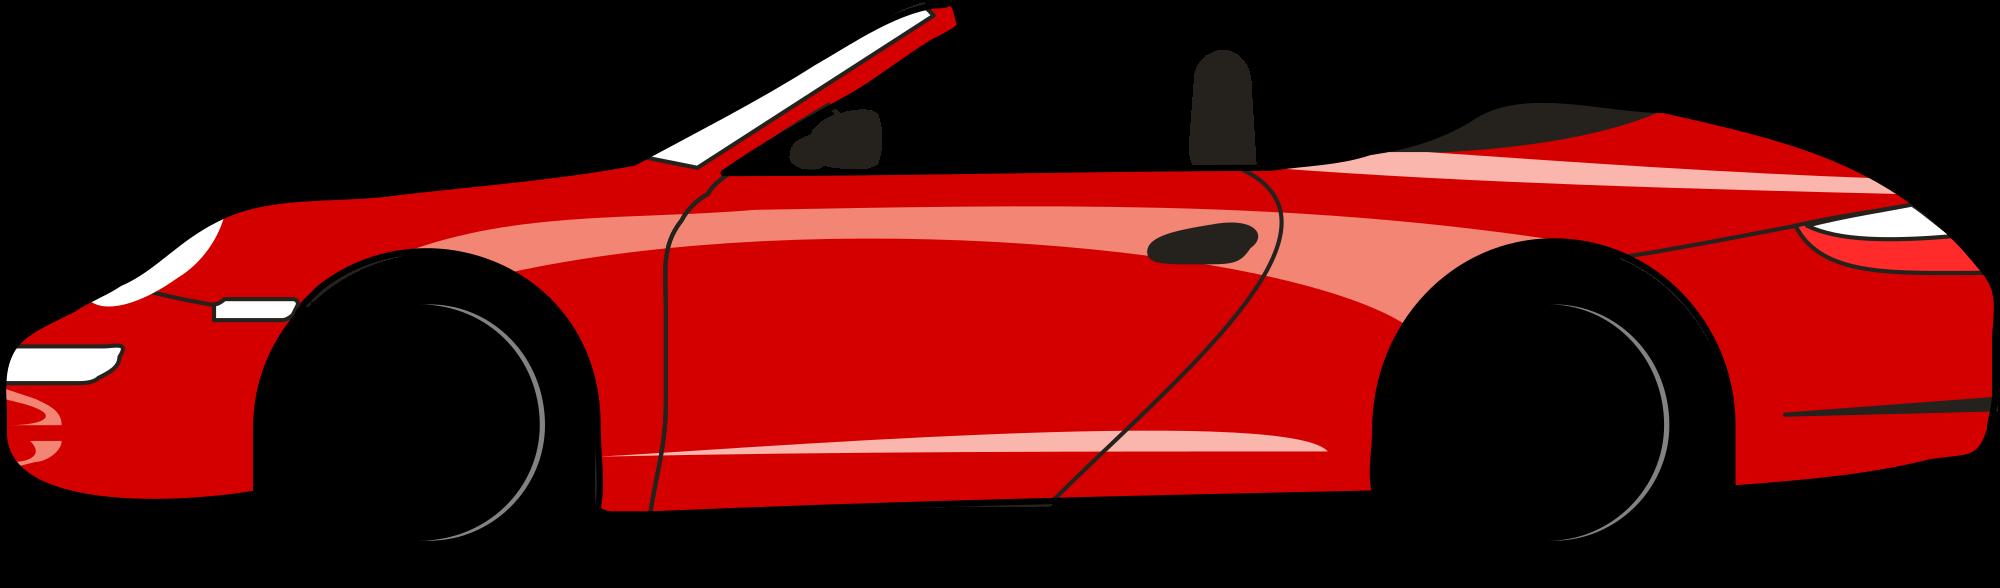 ... Car Clip Art - clipartall ...-... Car Clip Art - clipartall ...-10